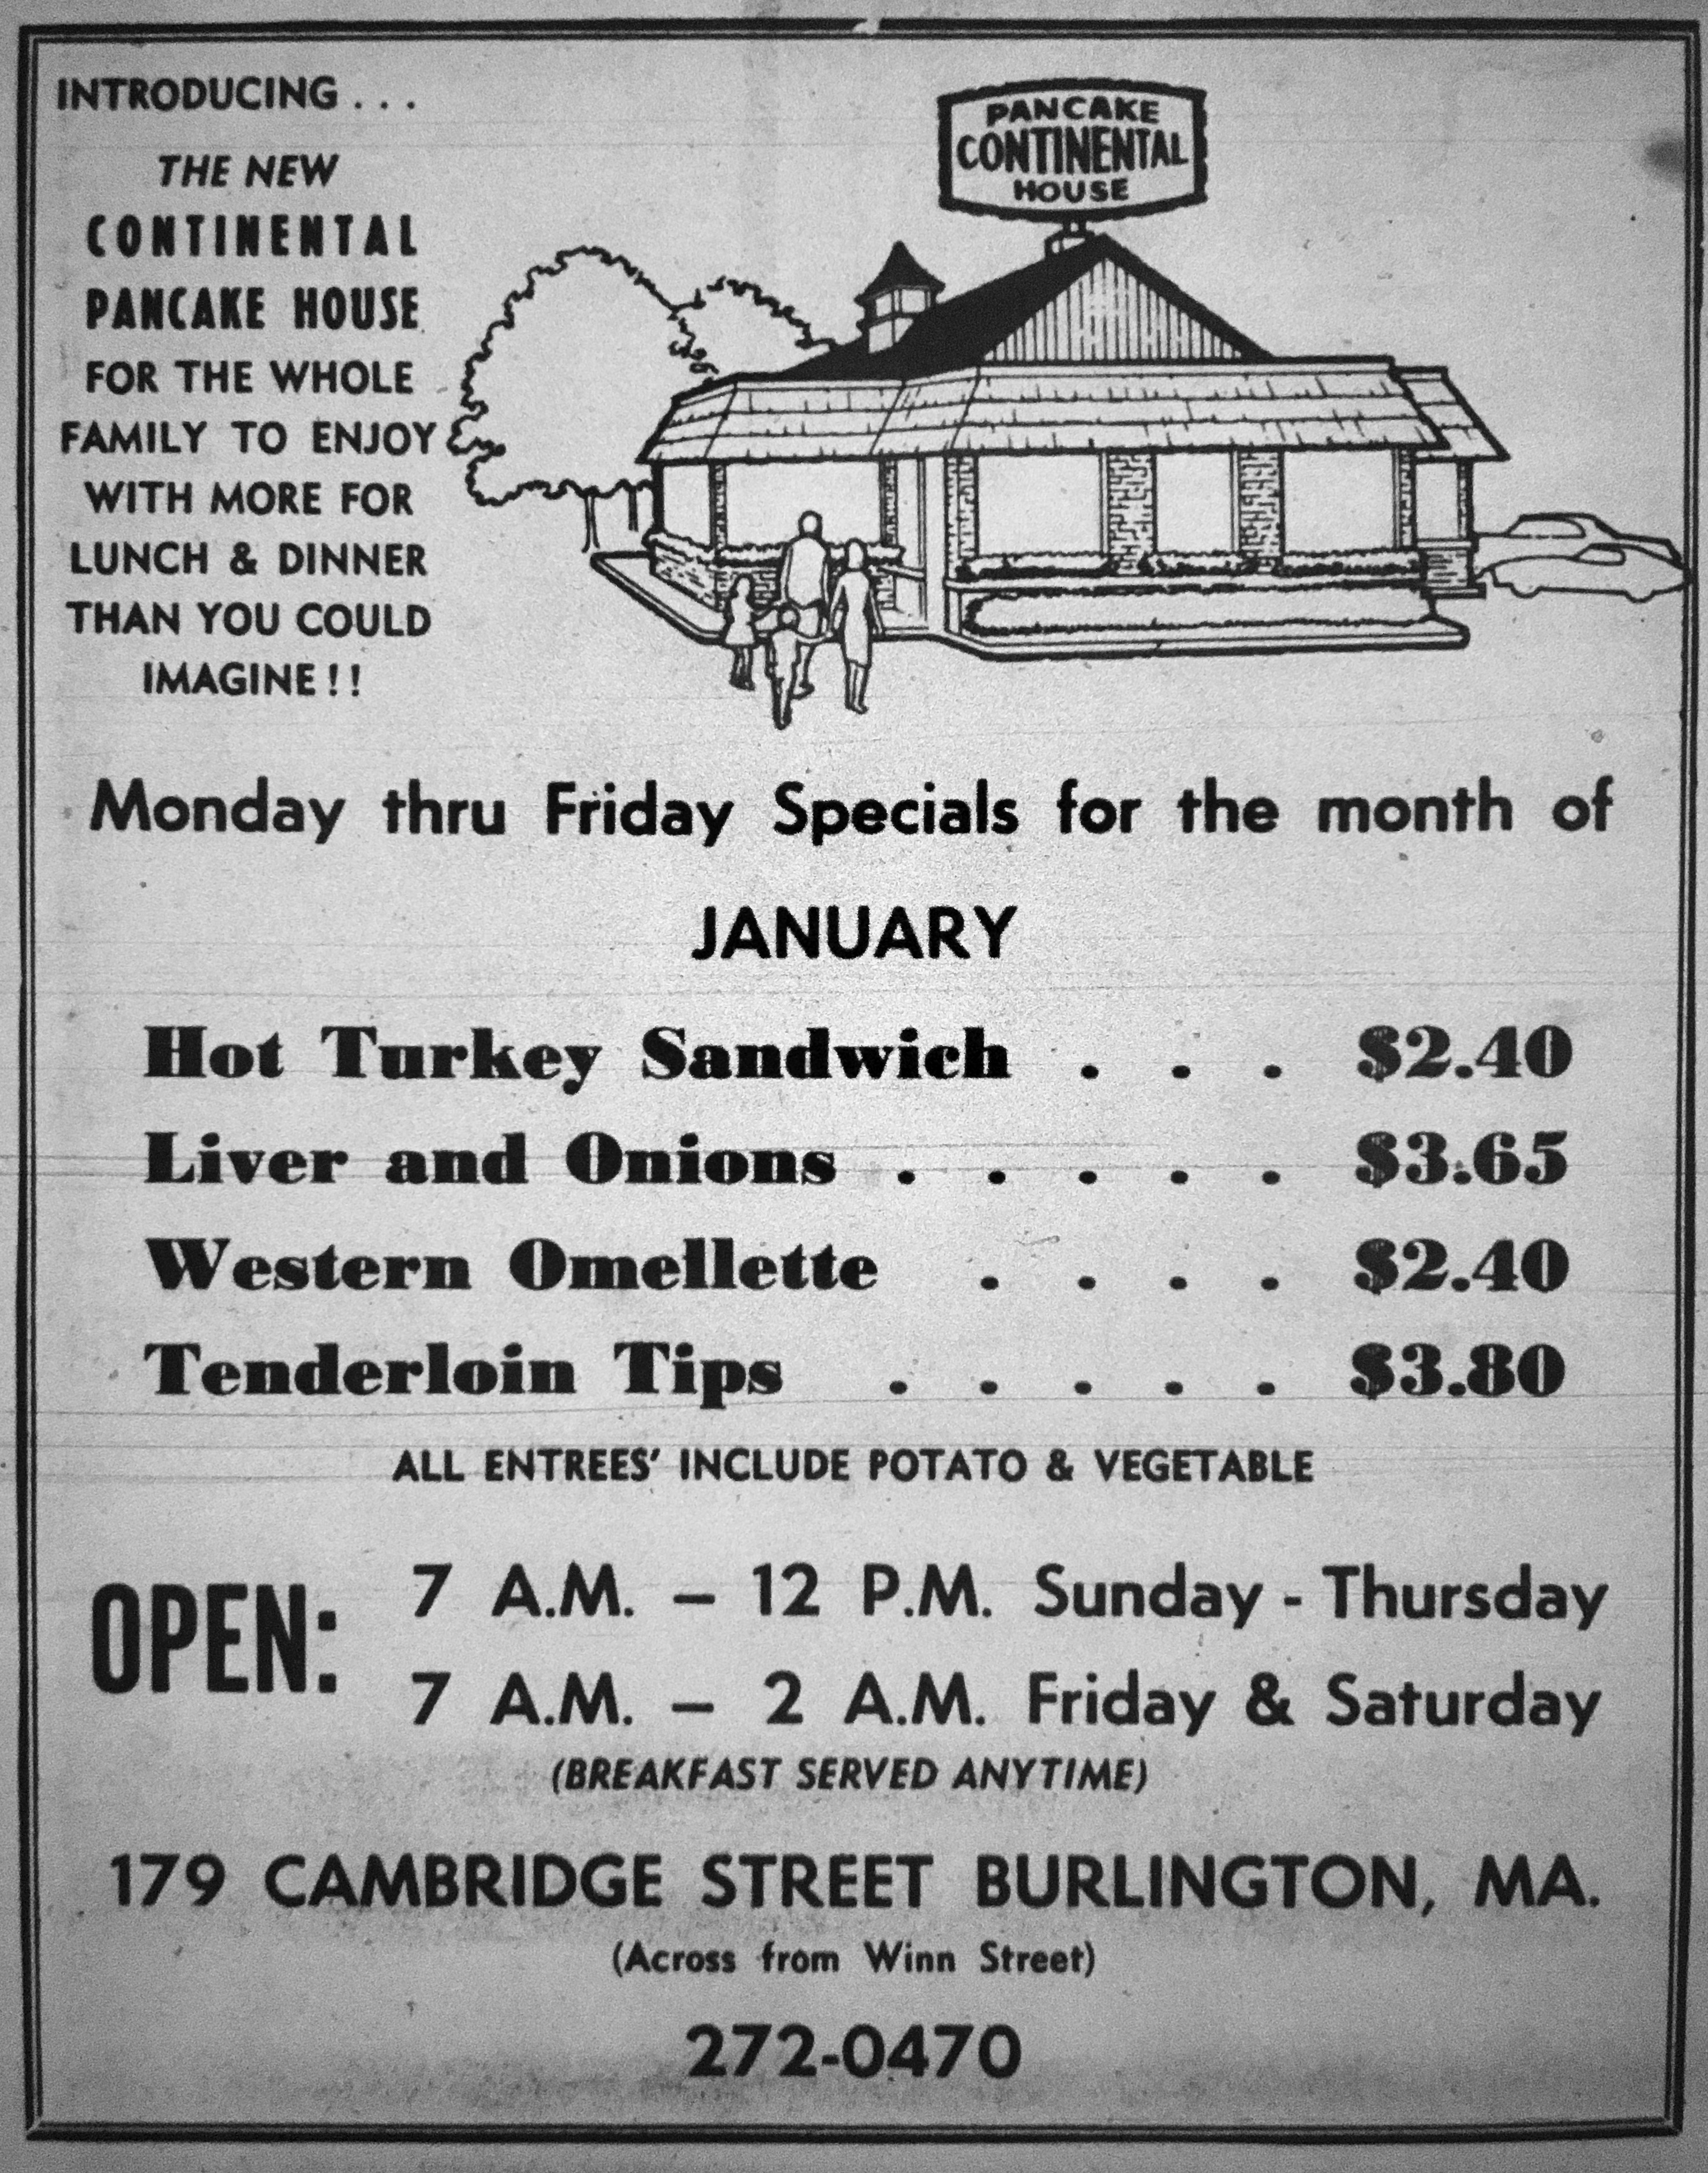 Continental Pancake House, Burlington MA